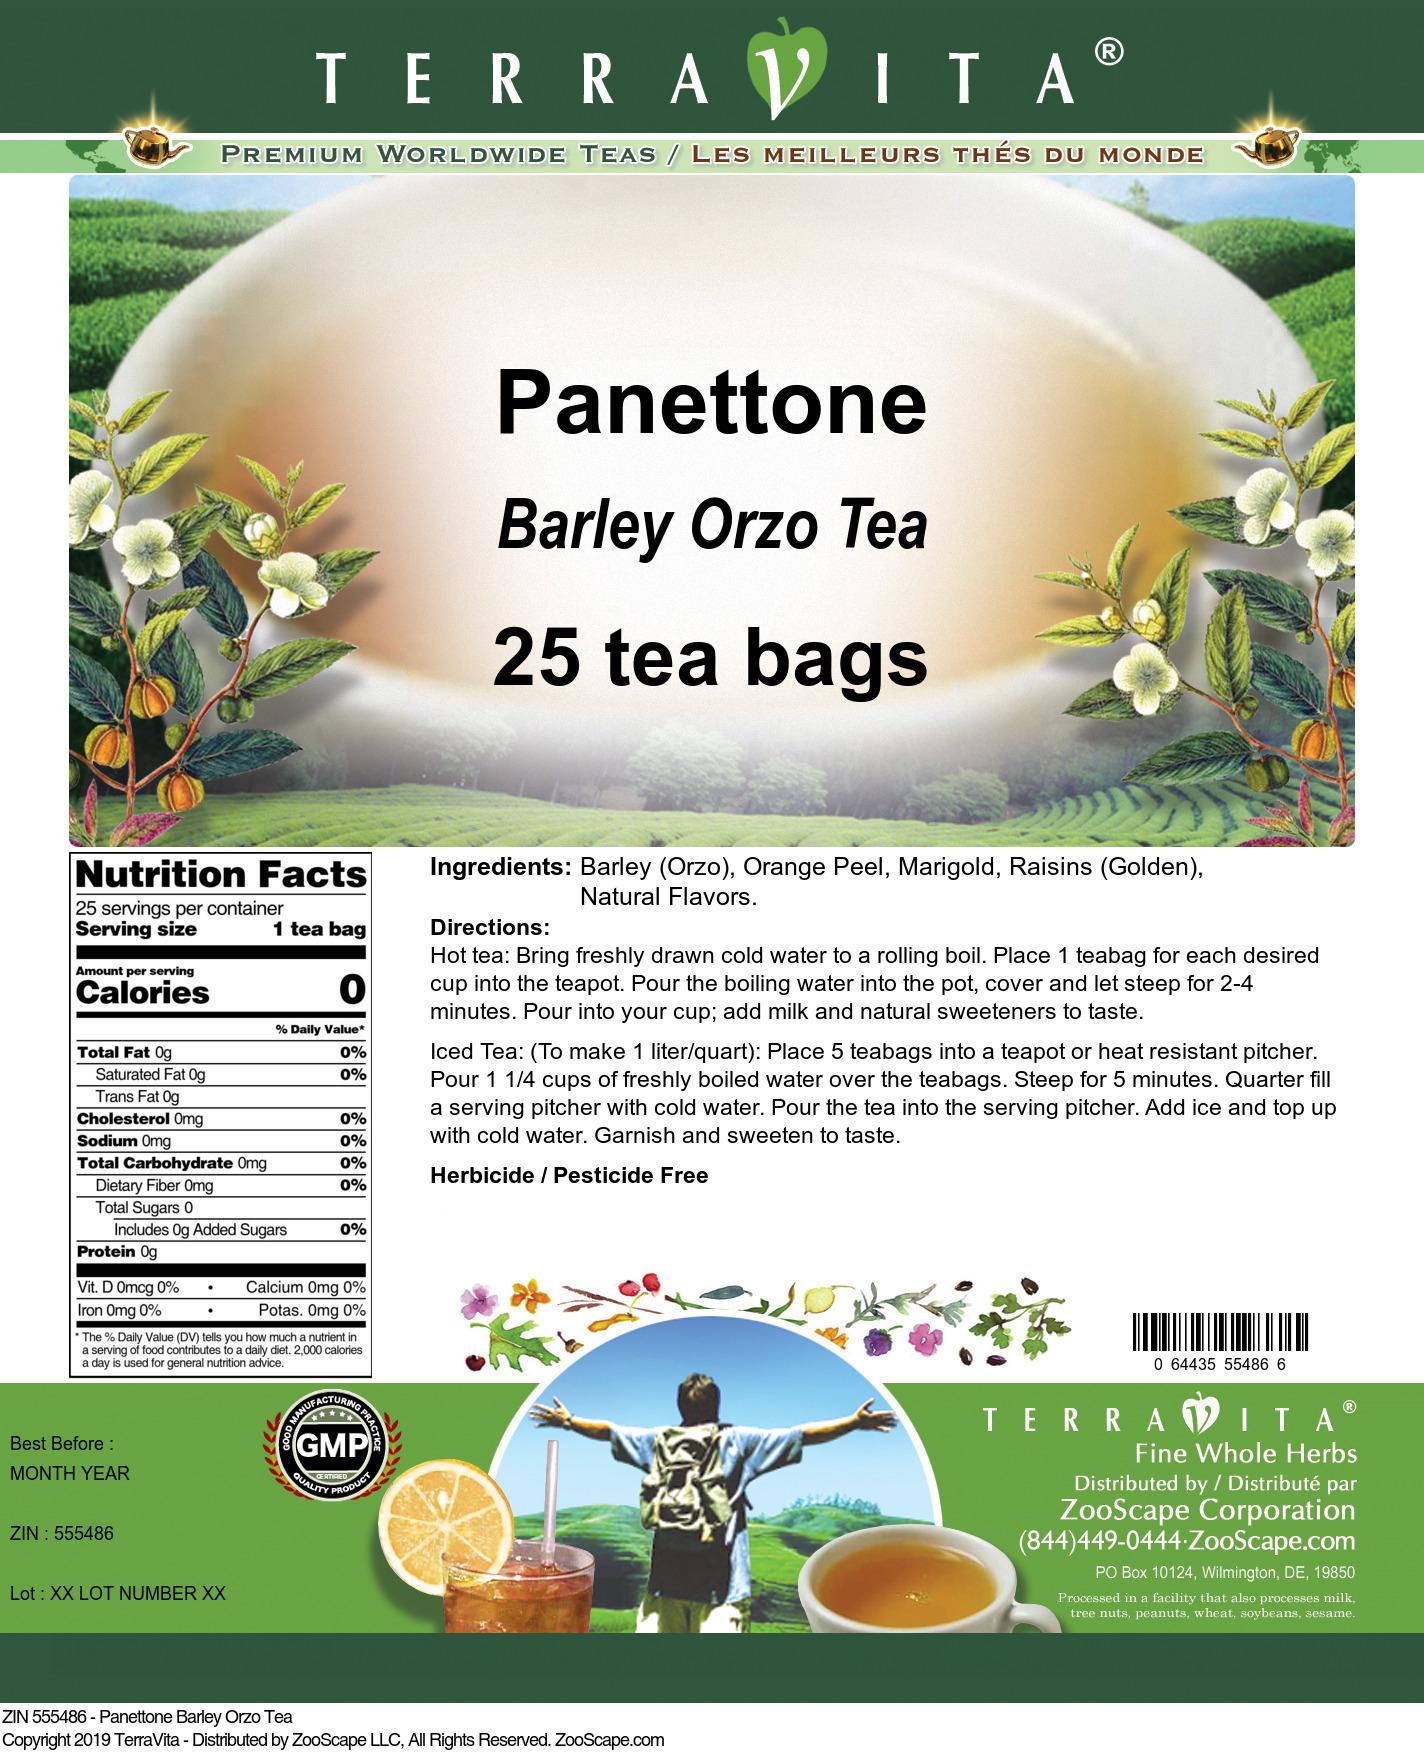 Panettone Barley Orzo Tea